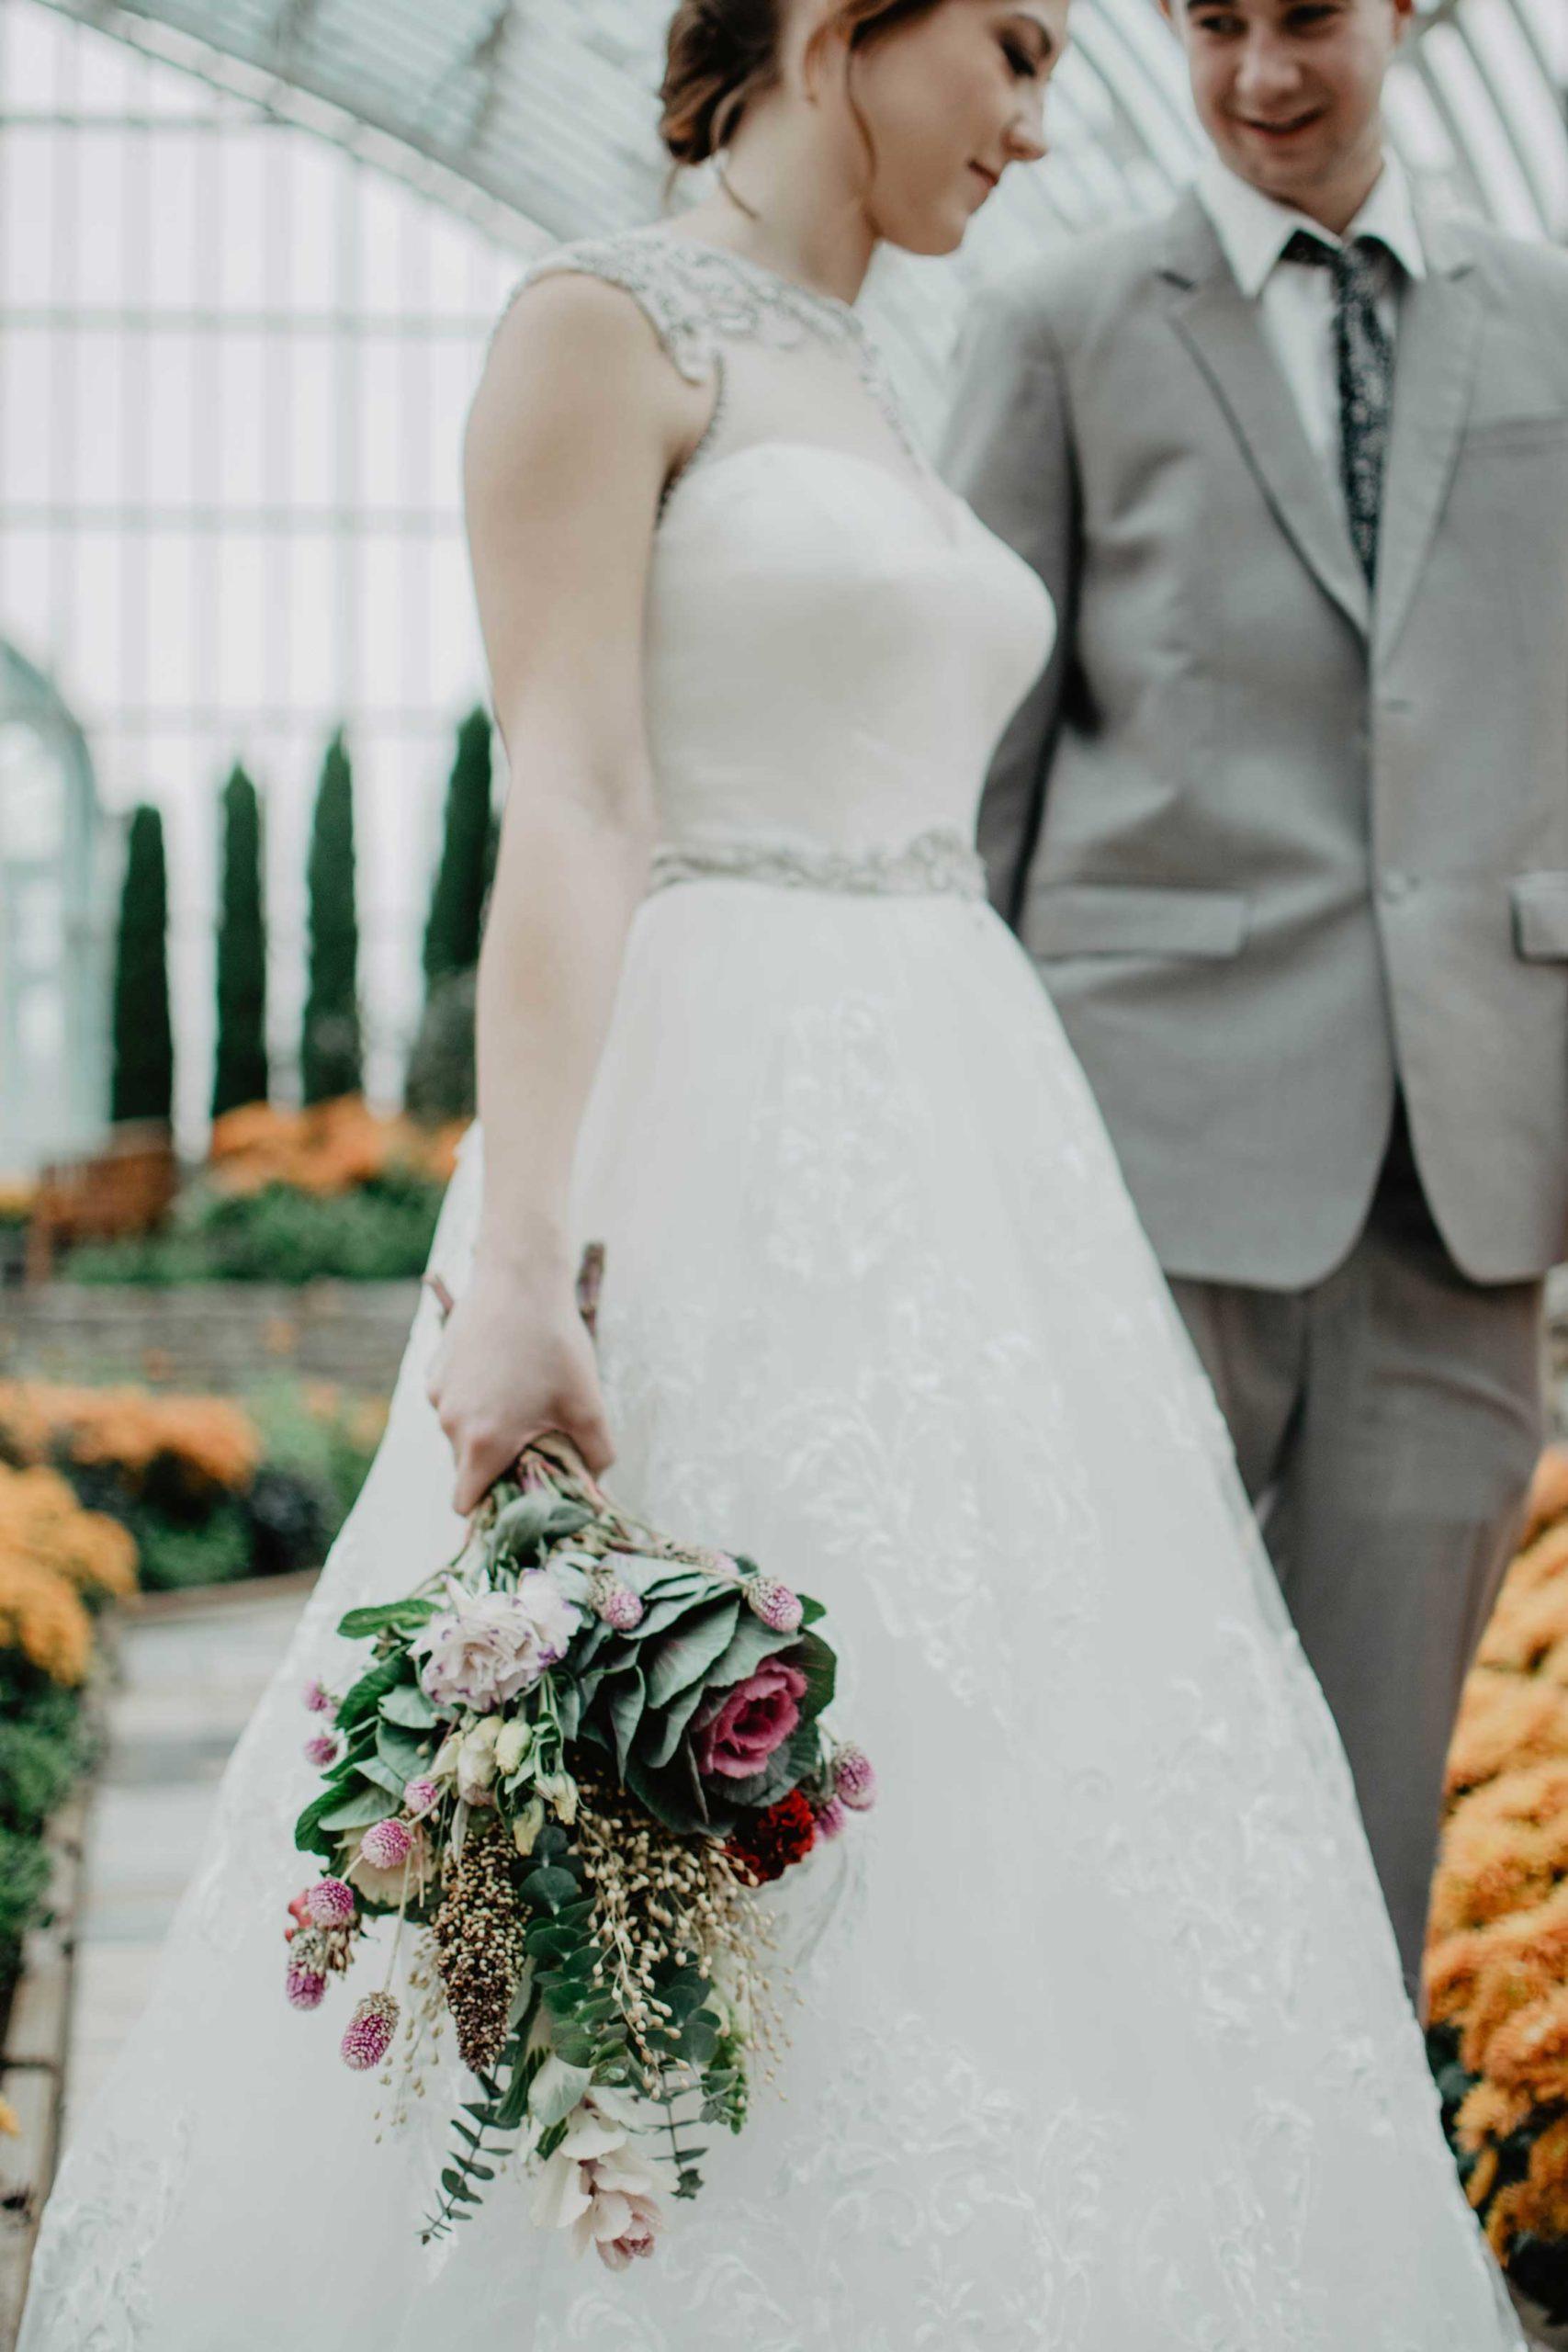 postponing your wedding date